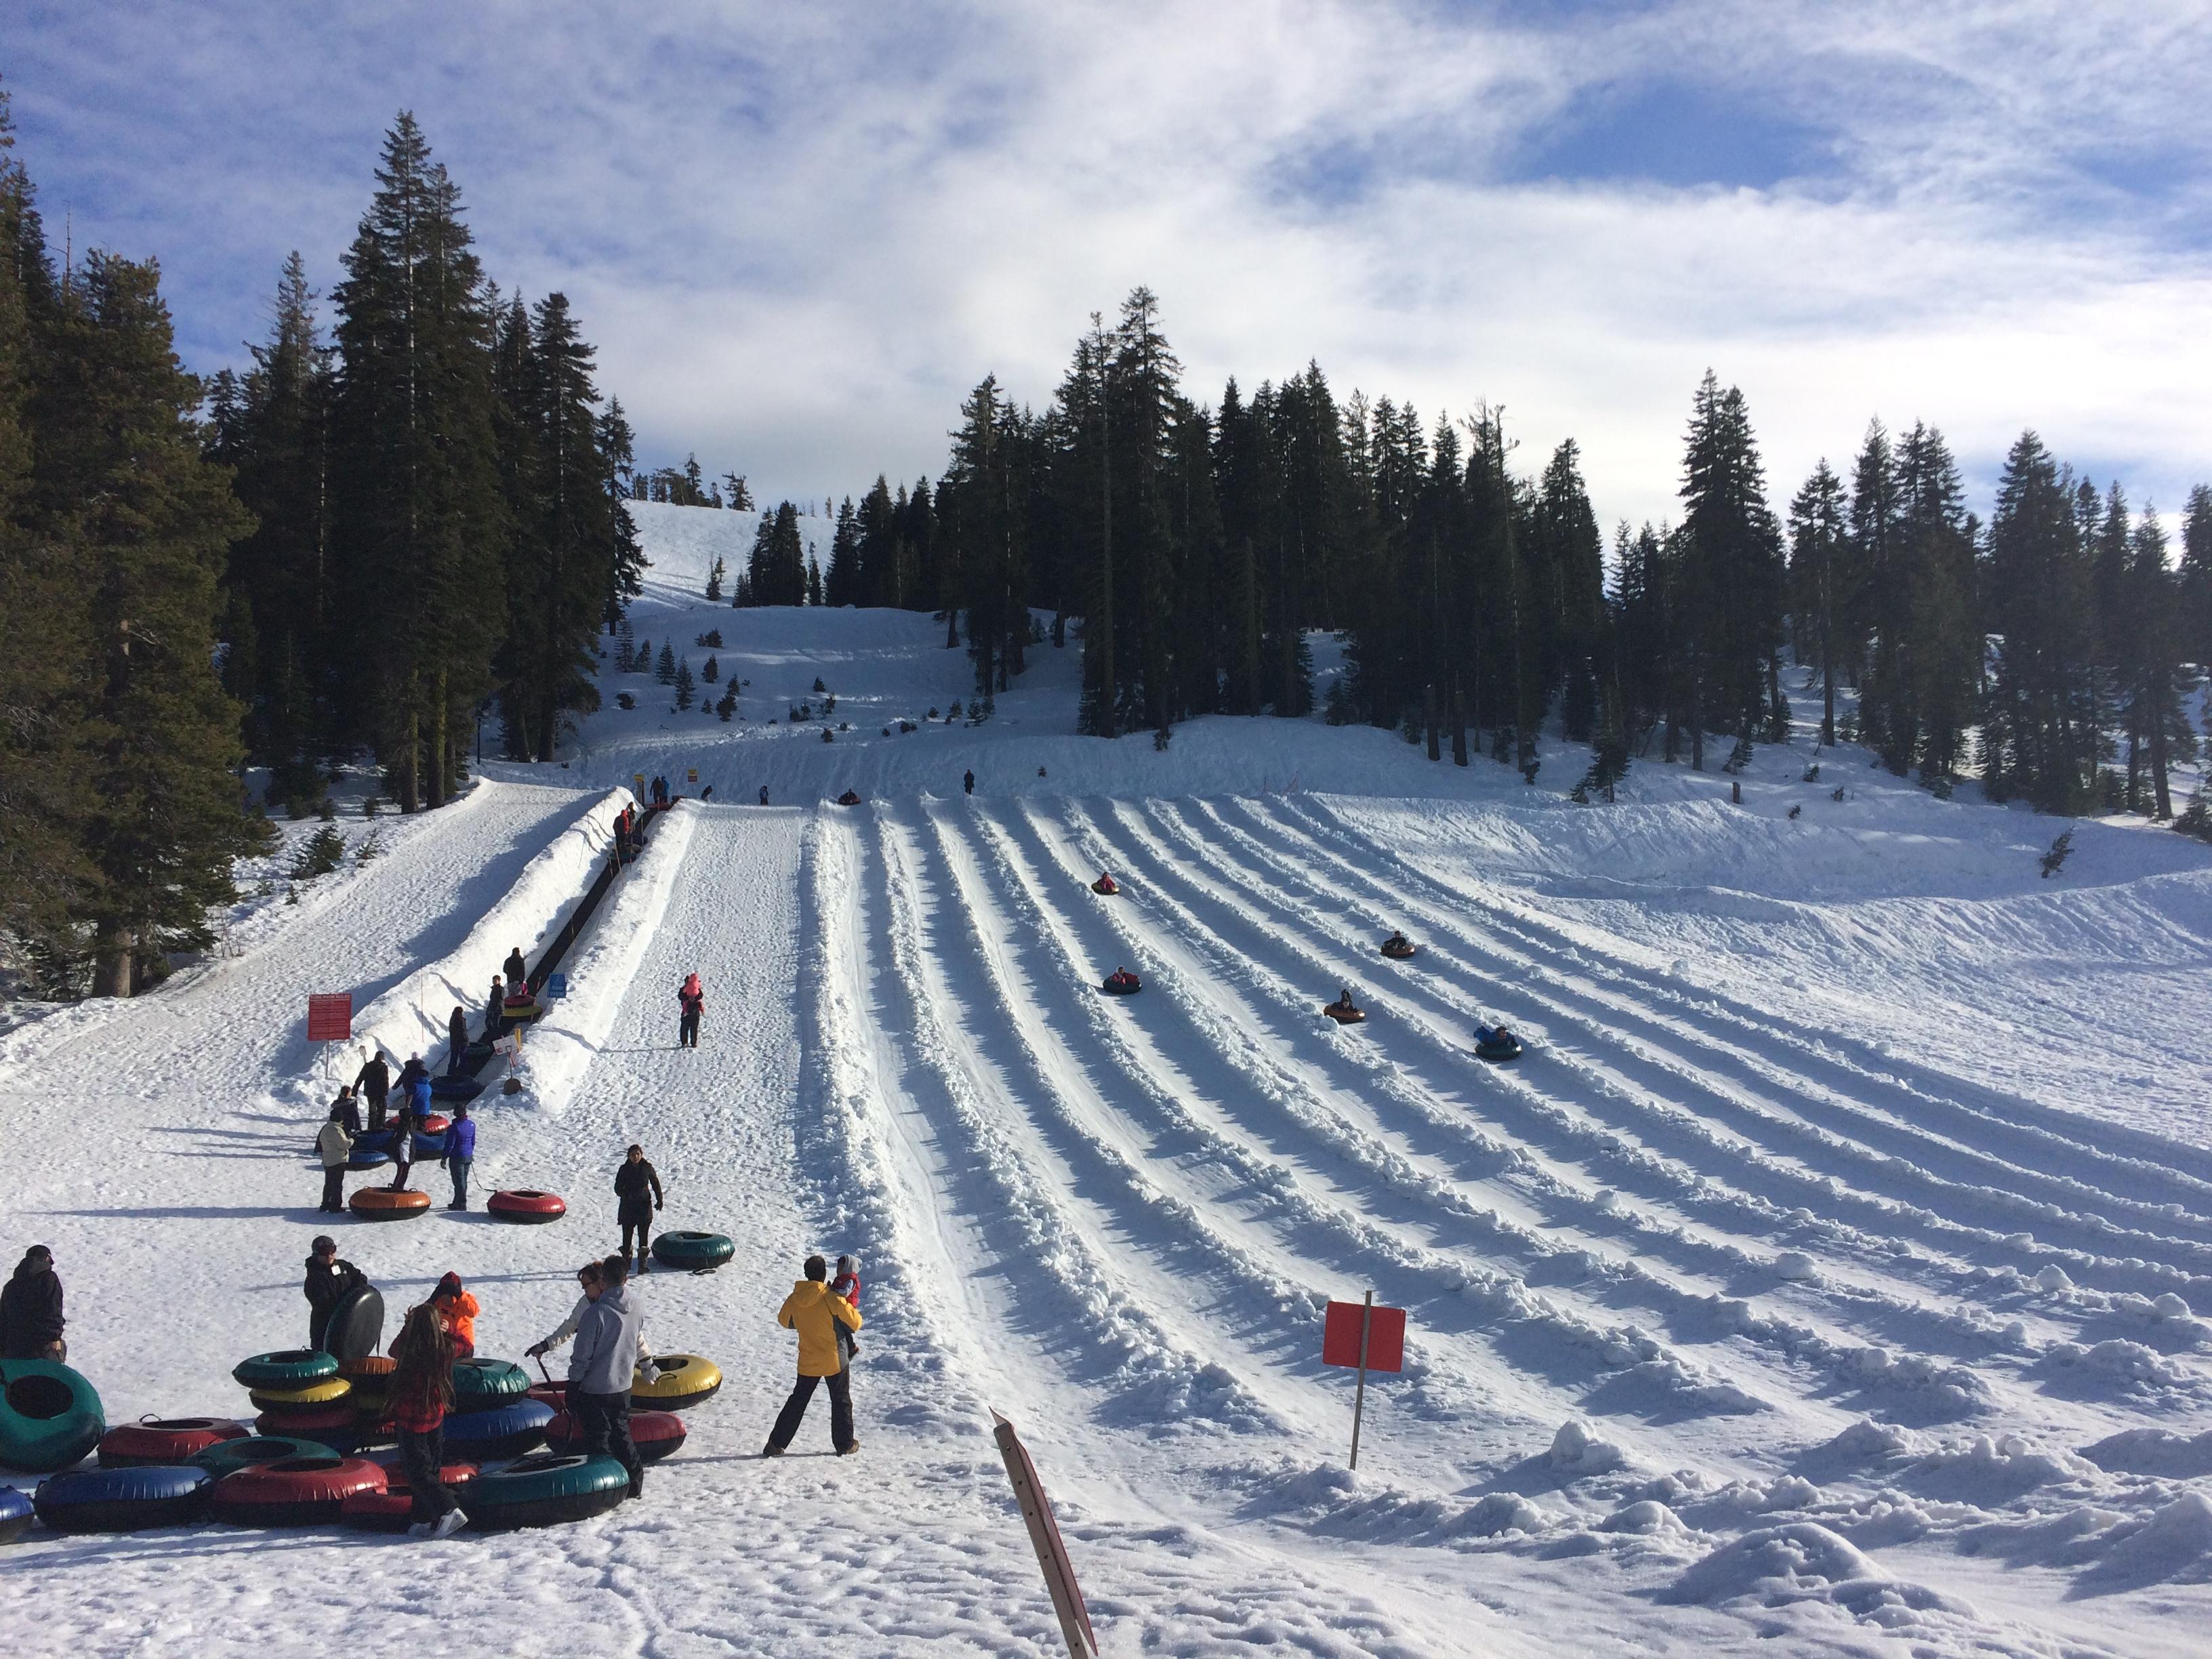 snow fun is just a short drive away | sacramentokids